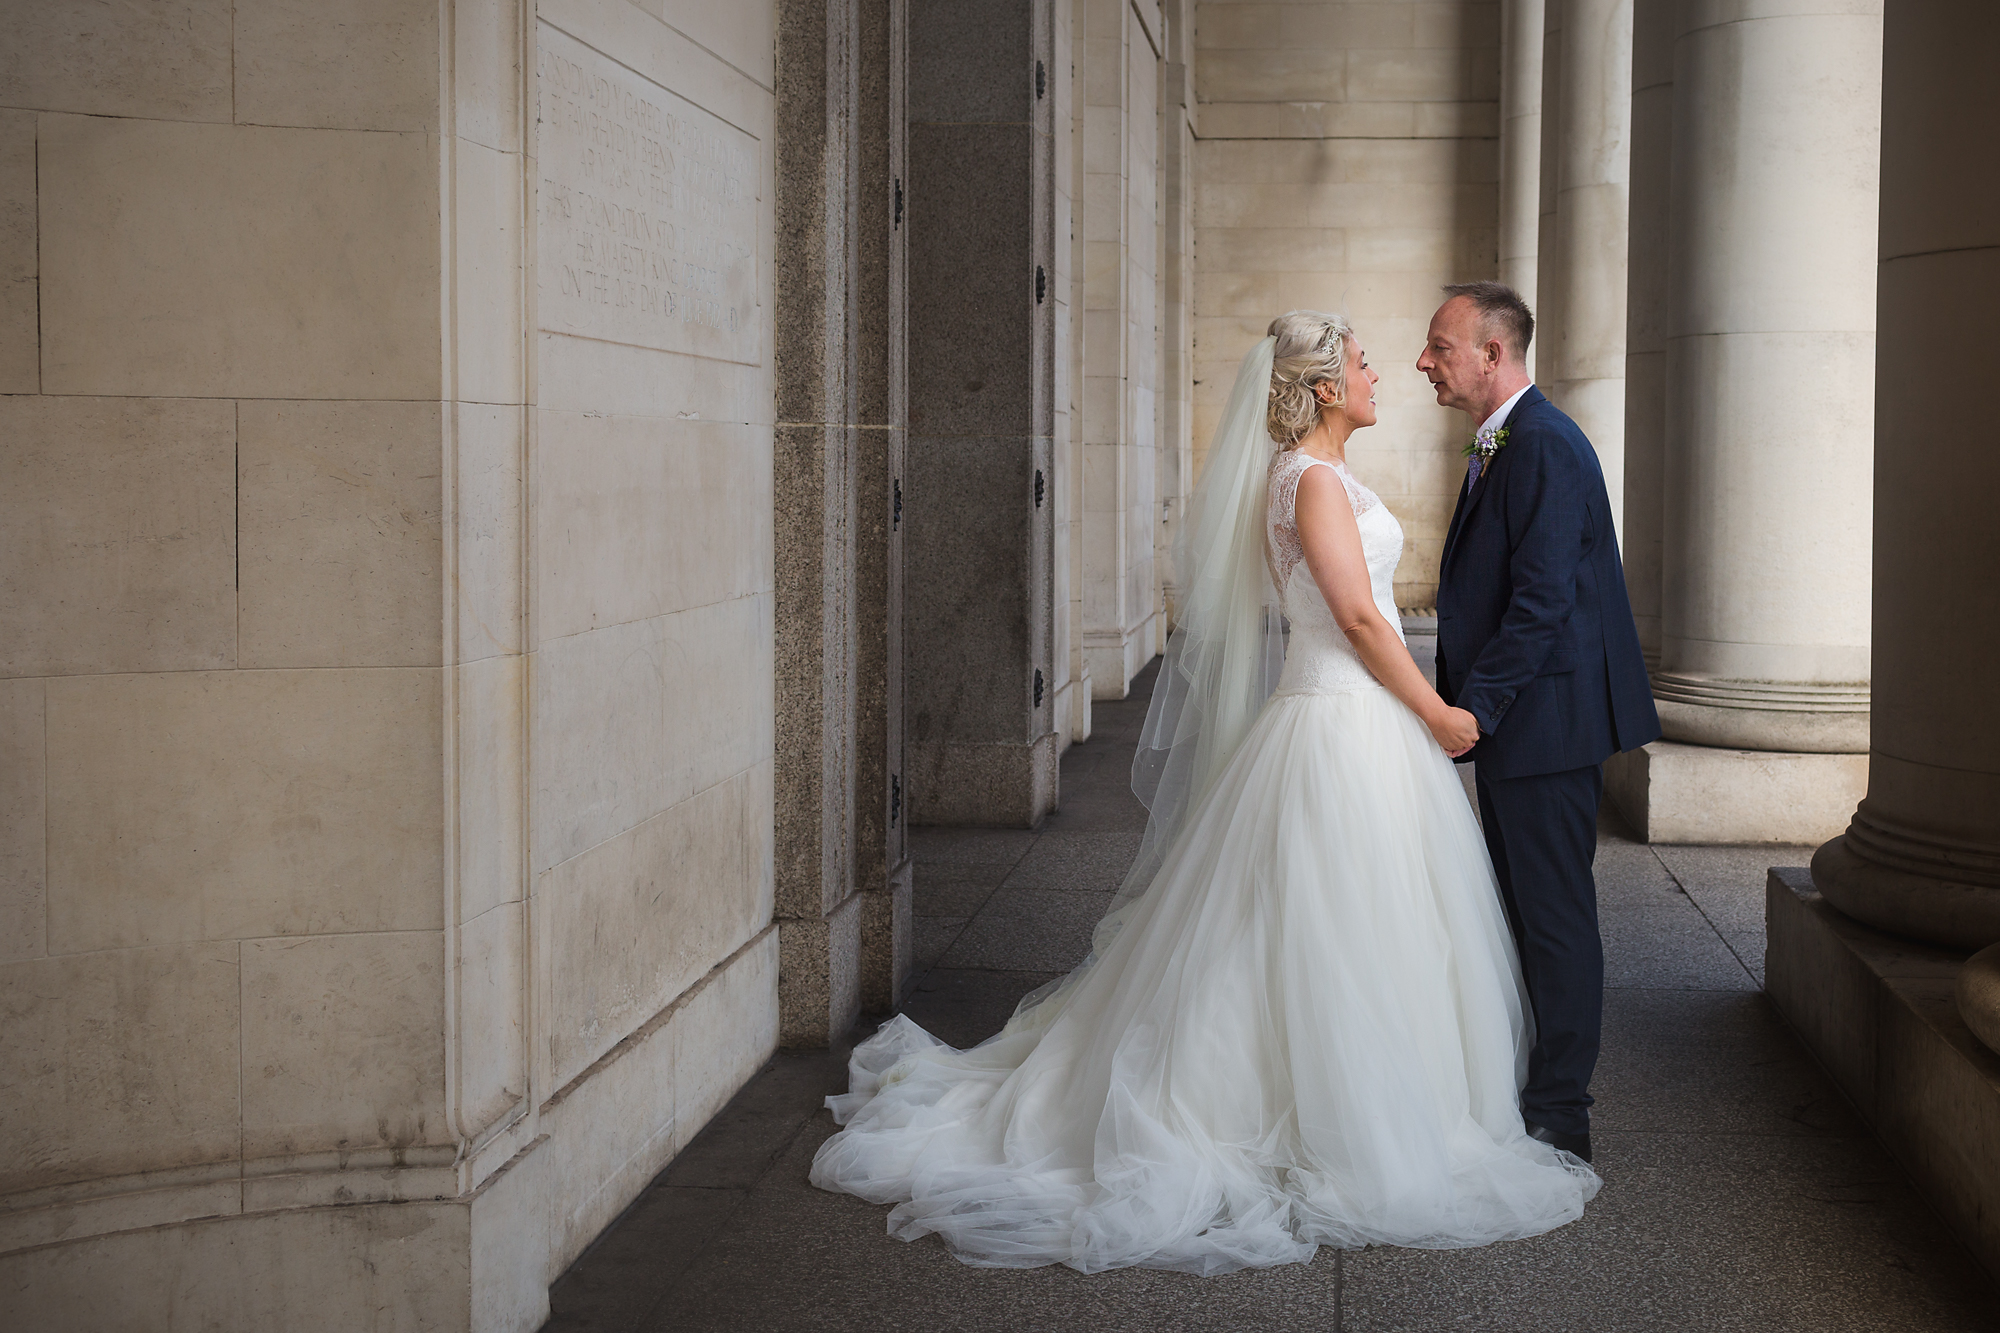 Cardiff Museum wedding photos, cardiff city hall wedding photos